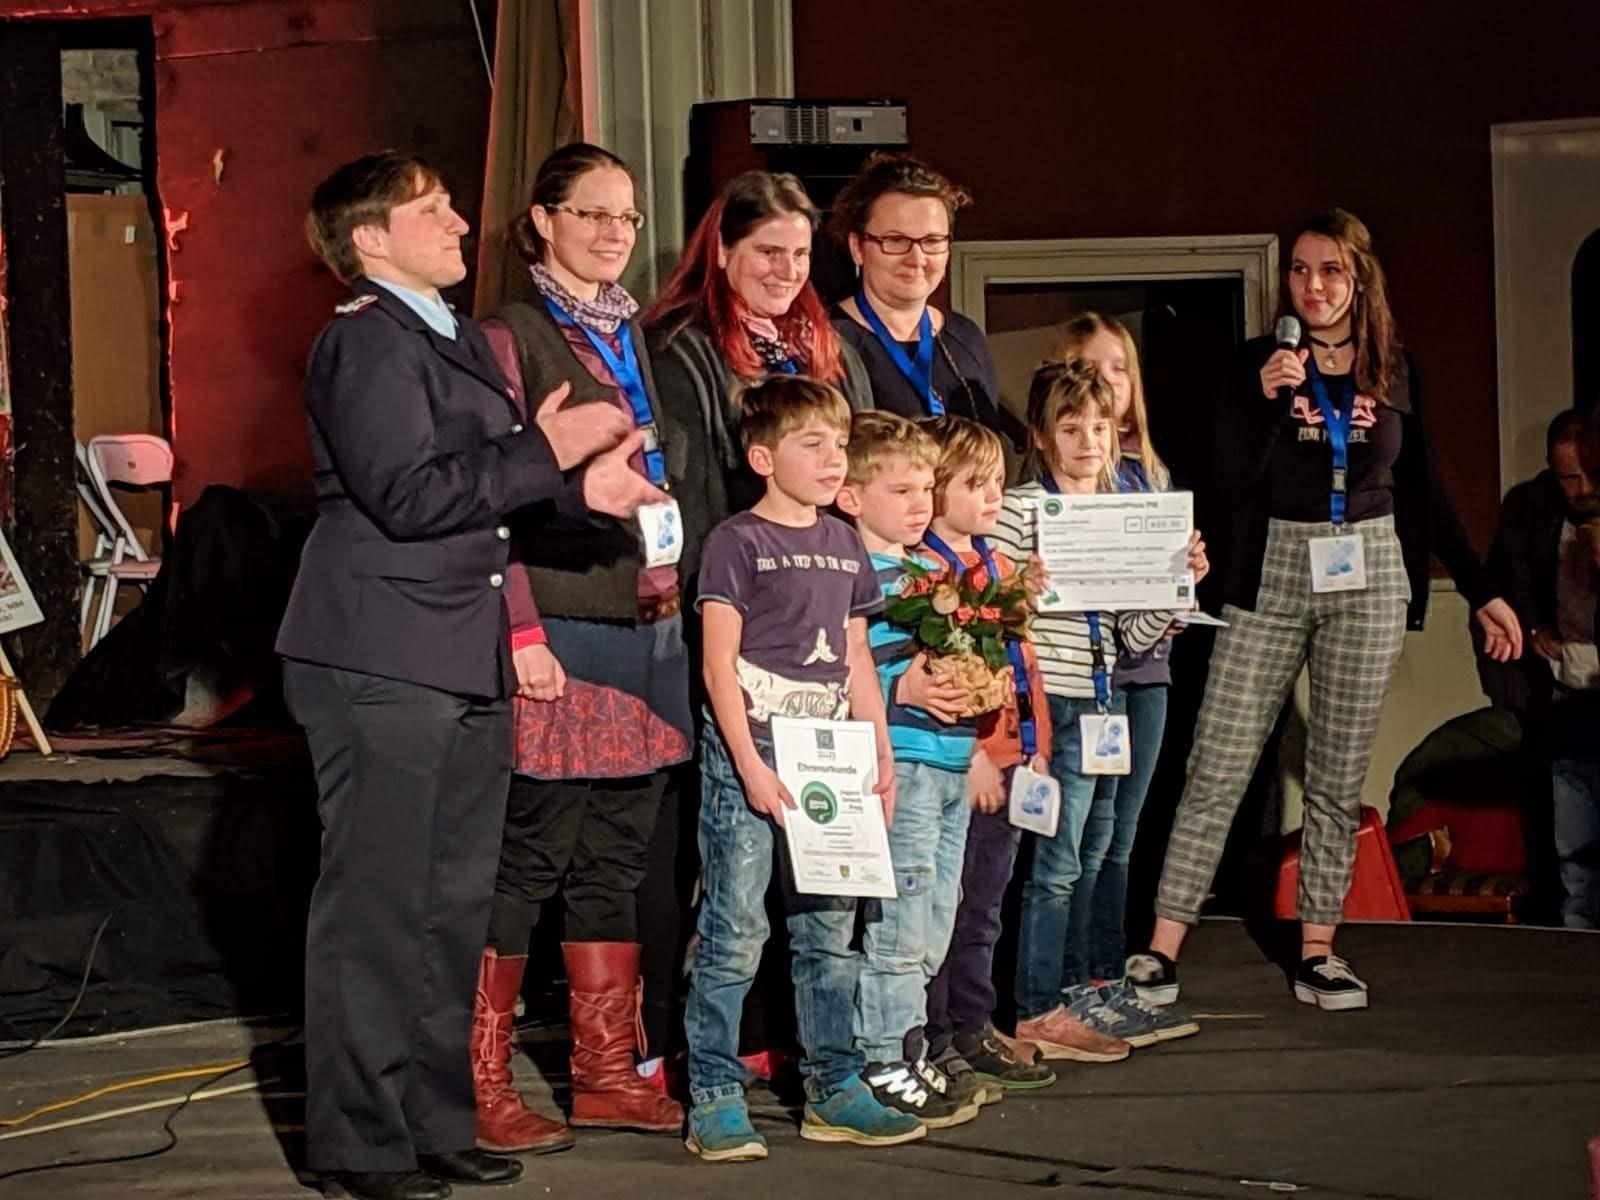 Tipidorf, Jugendumweltpreis 2018, Potsdam-Mittelmark, Borkwalde